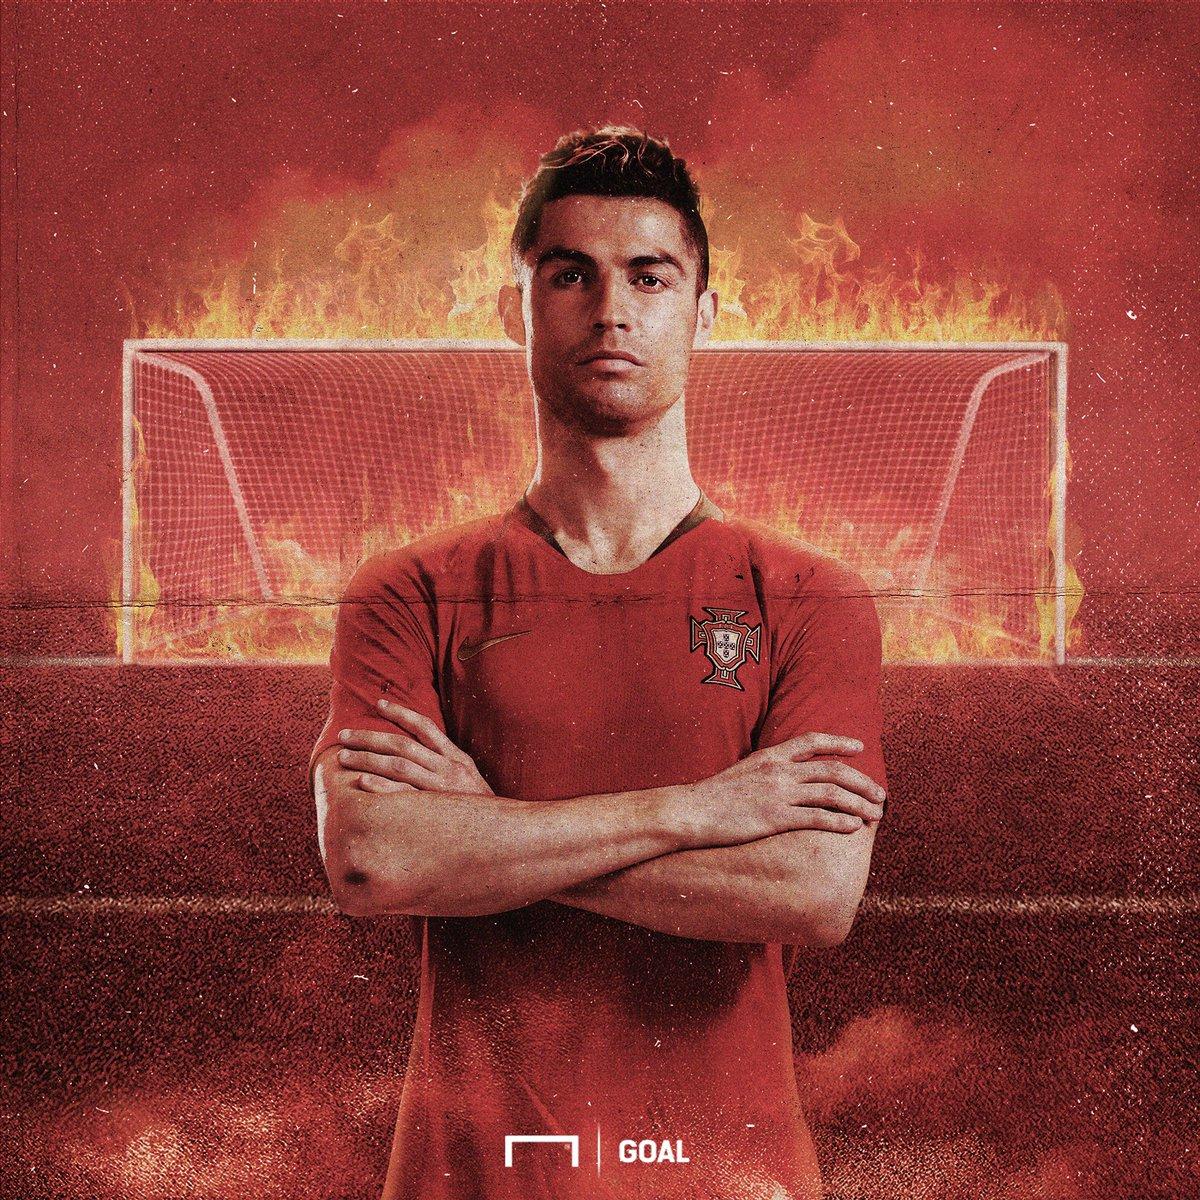 Ali Daei (109)  Cristiano Ronaldo (98)  Ferenc Puskas (84)  CR7 is three goals closer to that top-scoring international record <br>http://pic.twitter.com/Ile08vVTmA